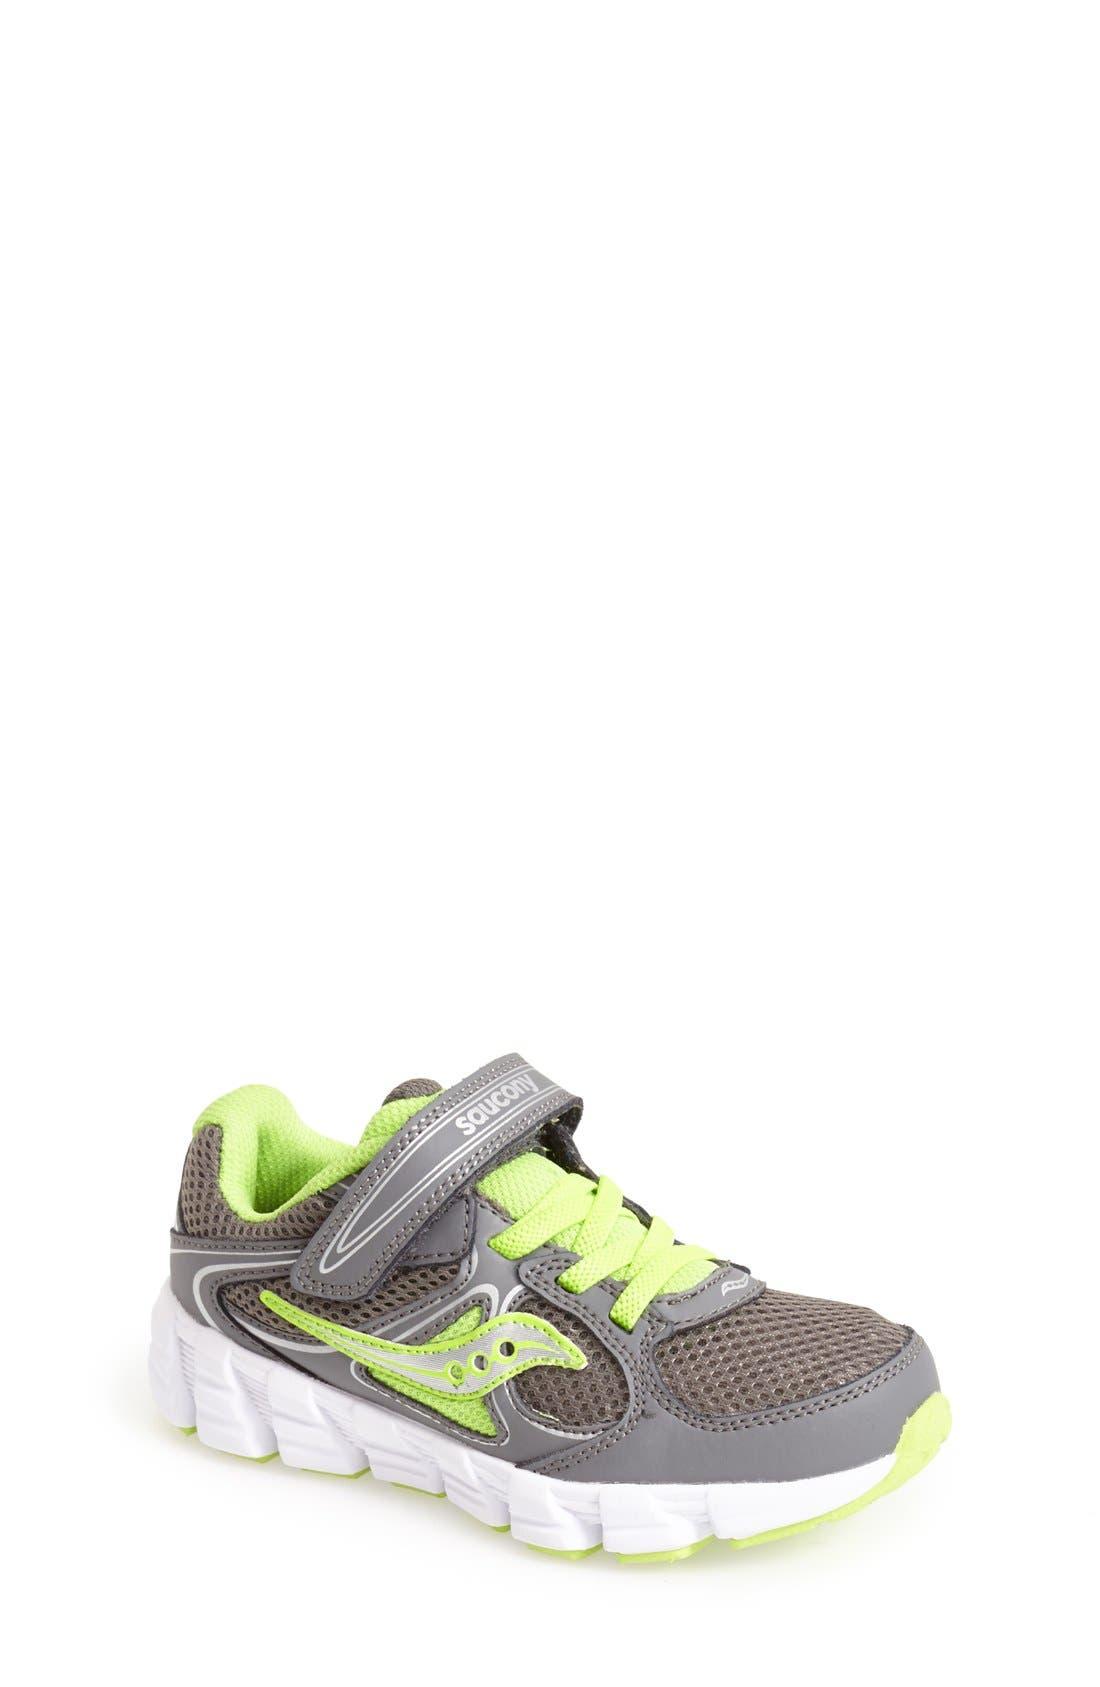 Main Image - Saucony 'Kotaro' Sneaker (Toddler, Little Kid & Big Kid